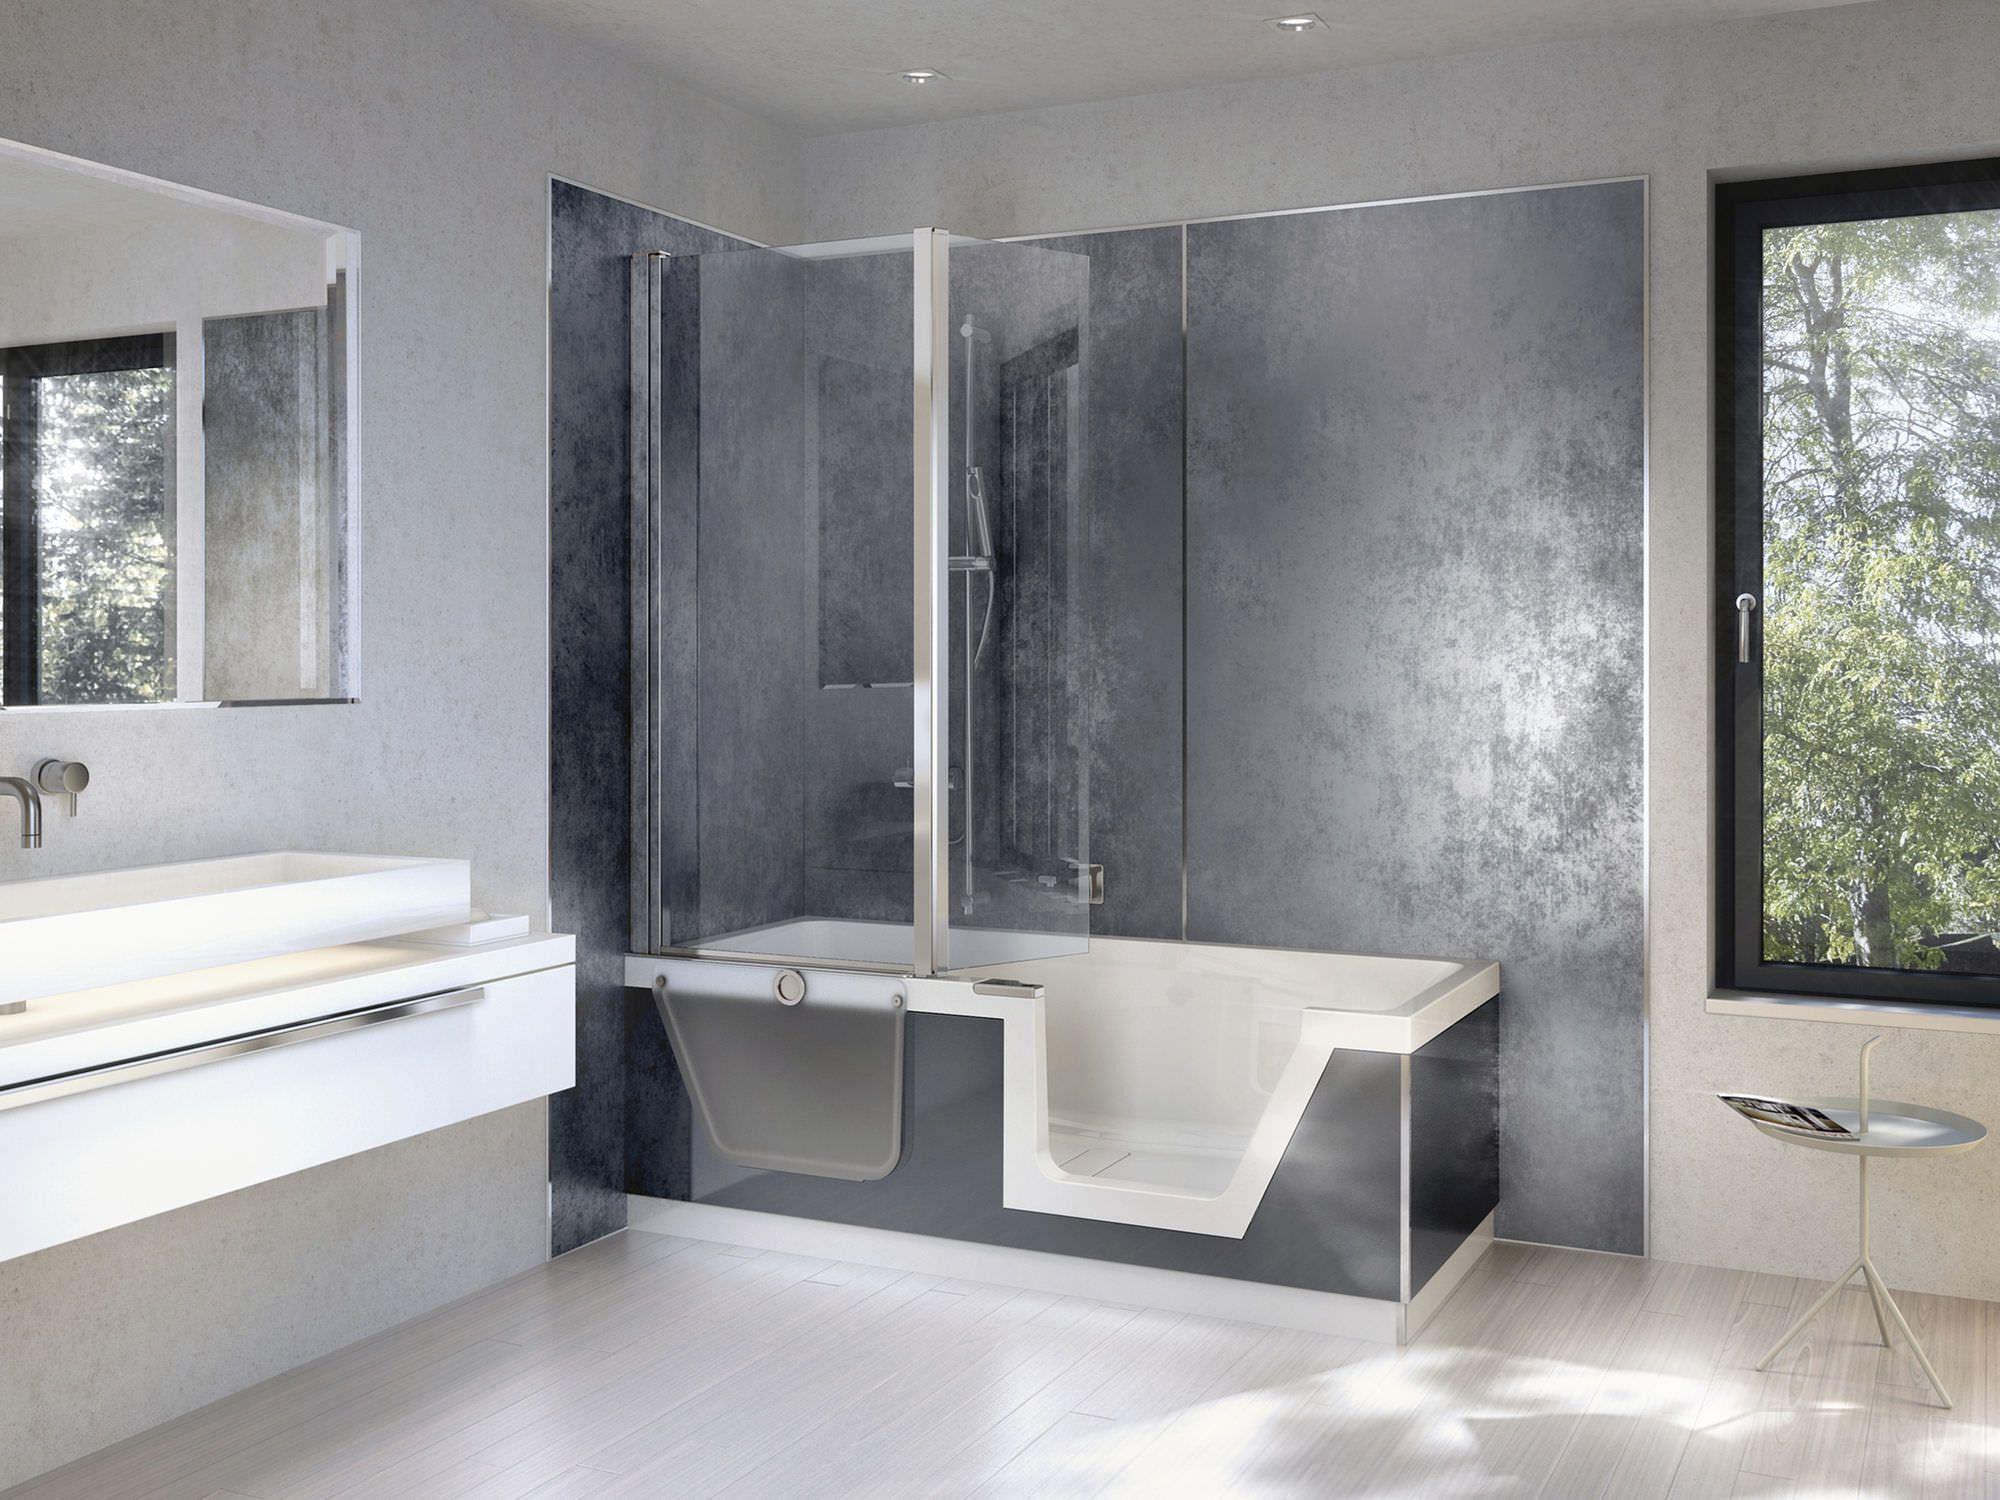 Fresh Le Roy Merlin Salle De Bain 3d Tub Shower Combo Shower Tub Bathroom Tub Shower Combo